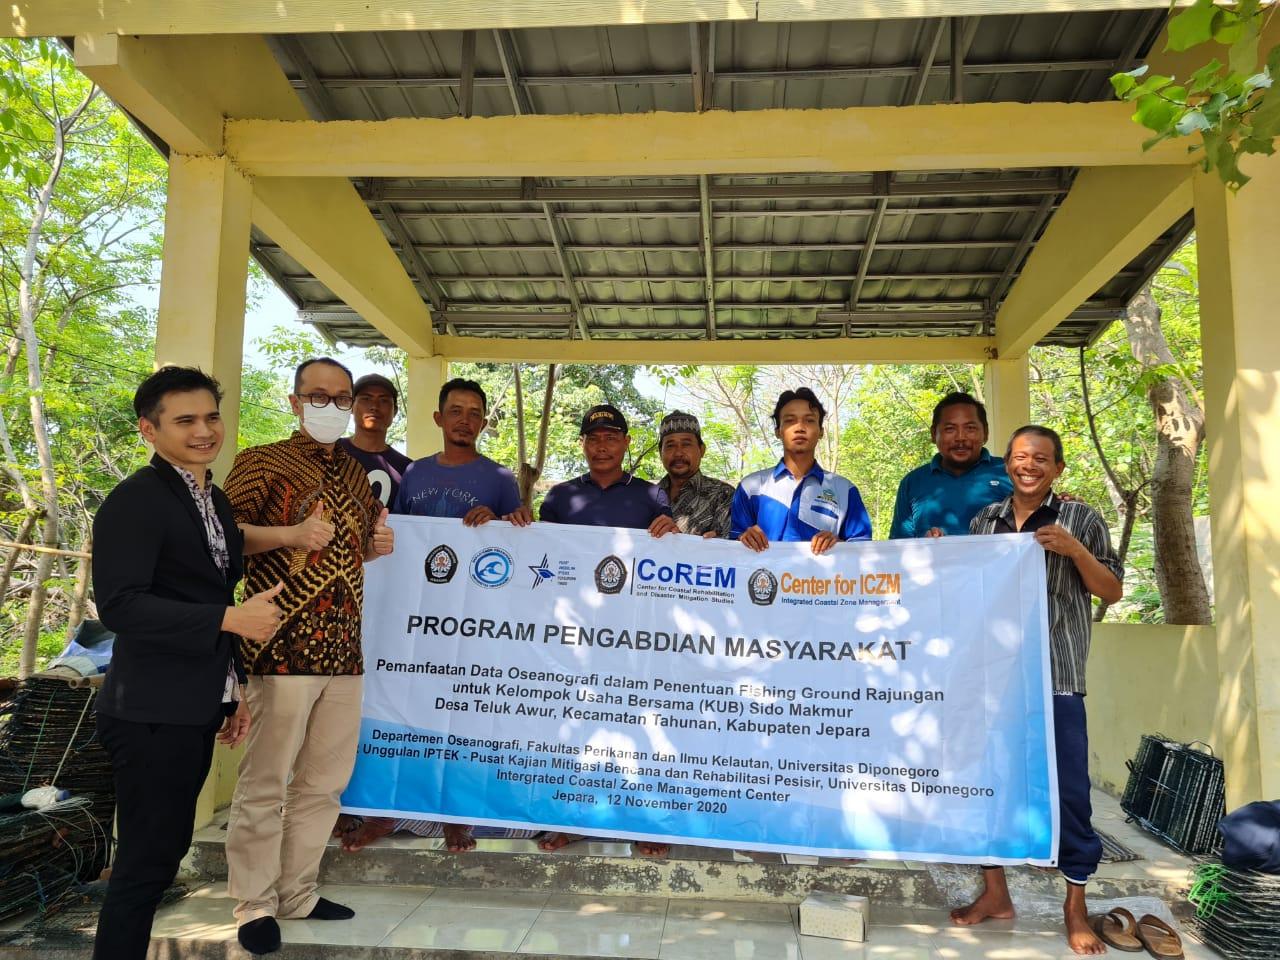 Pemanfaatan Data Oseanografi dalam Penentuan Fishing Ground Rajungan untuk KUB Sido Makmur dan KUB Jasa Laut, Desa Teluk Awur, Kecamatan Tahunan, Kabupaten Jepara